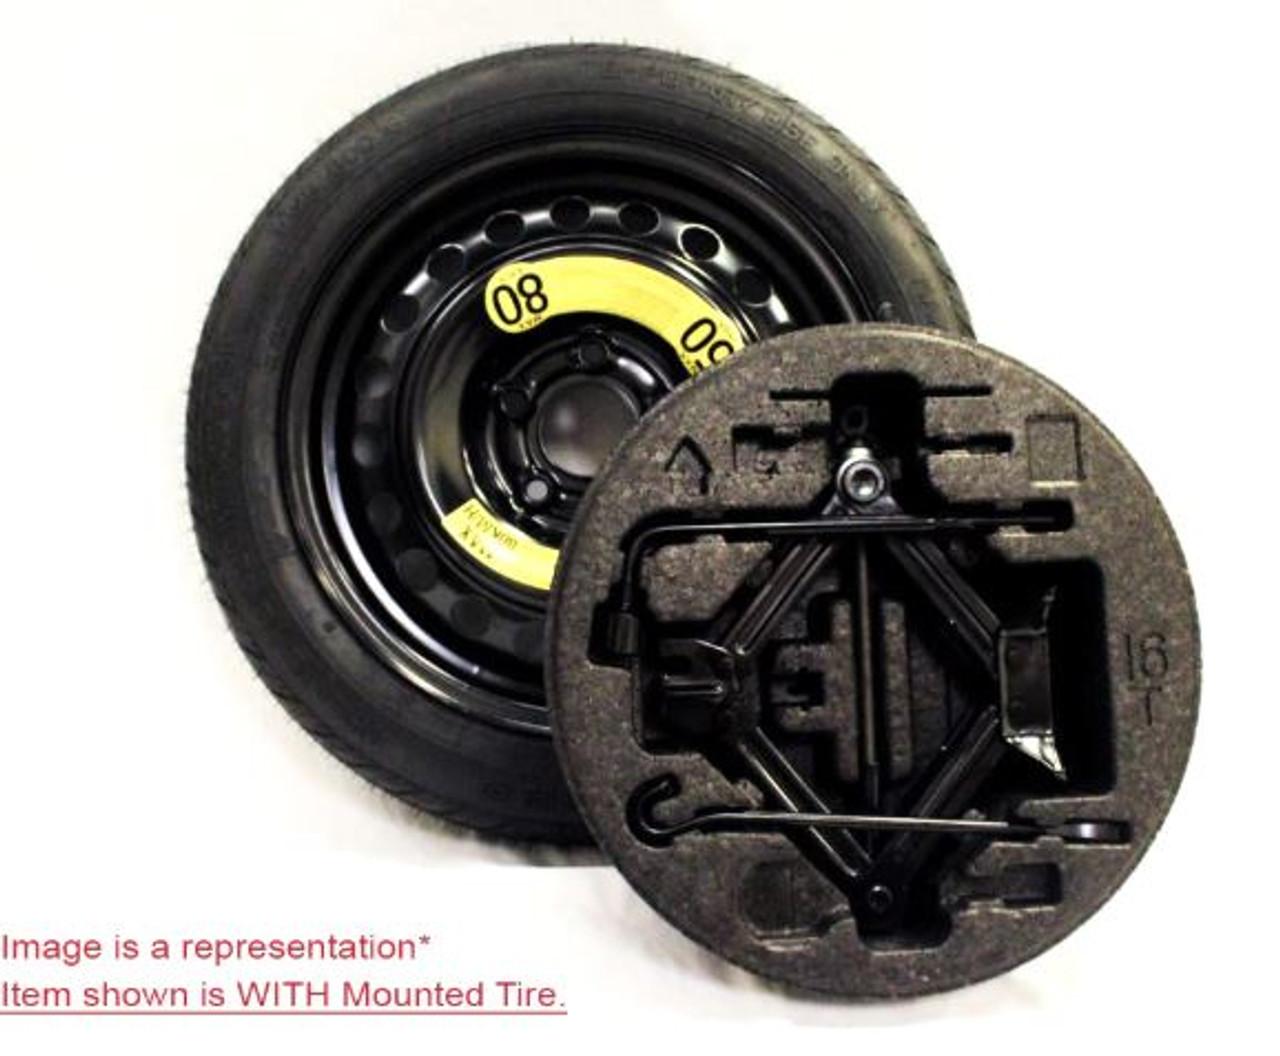 2012-2016 Hyundai Accent Spare Tire Kit (A067)